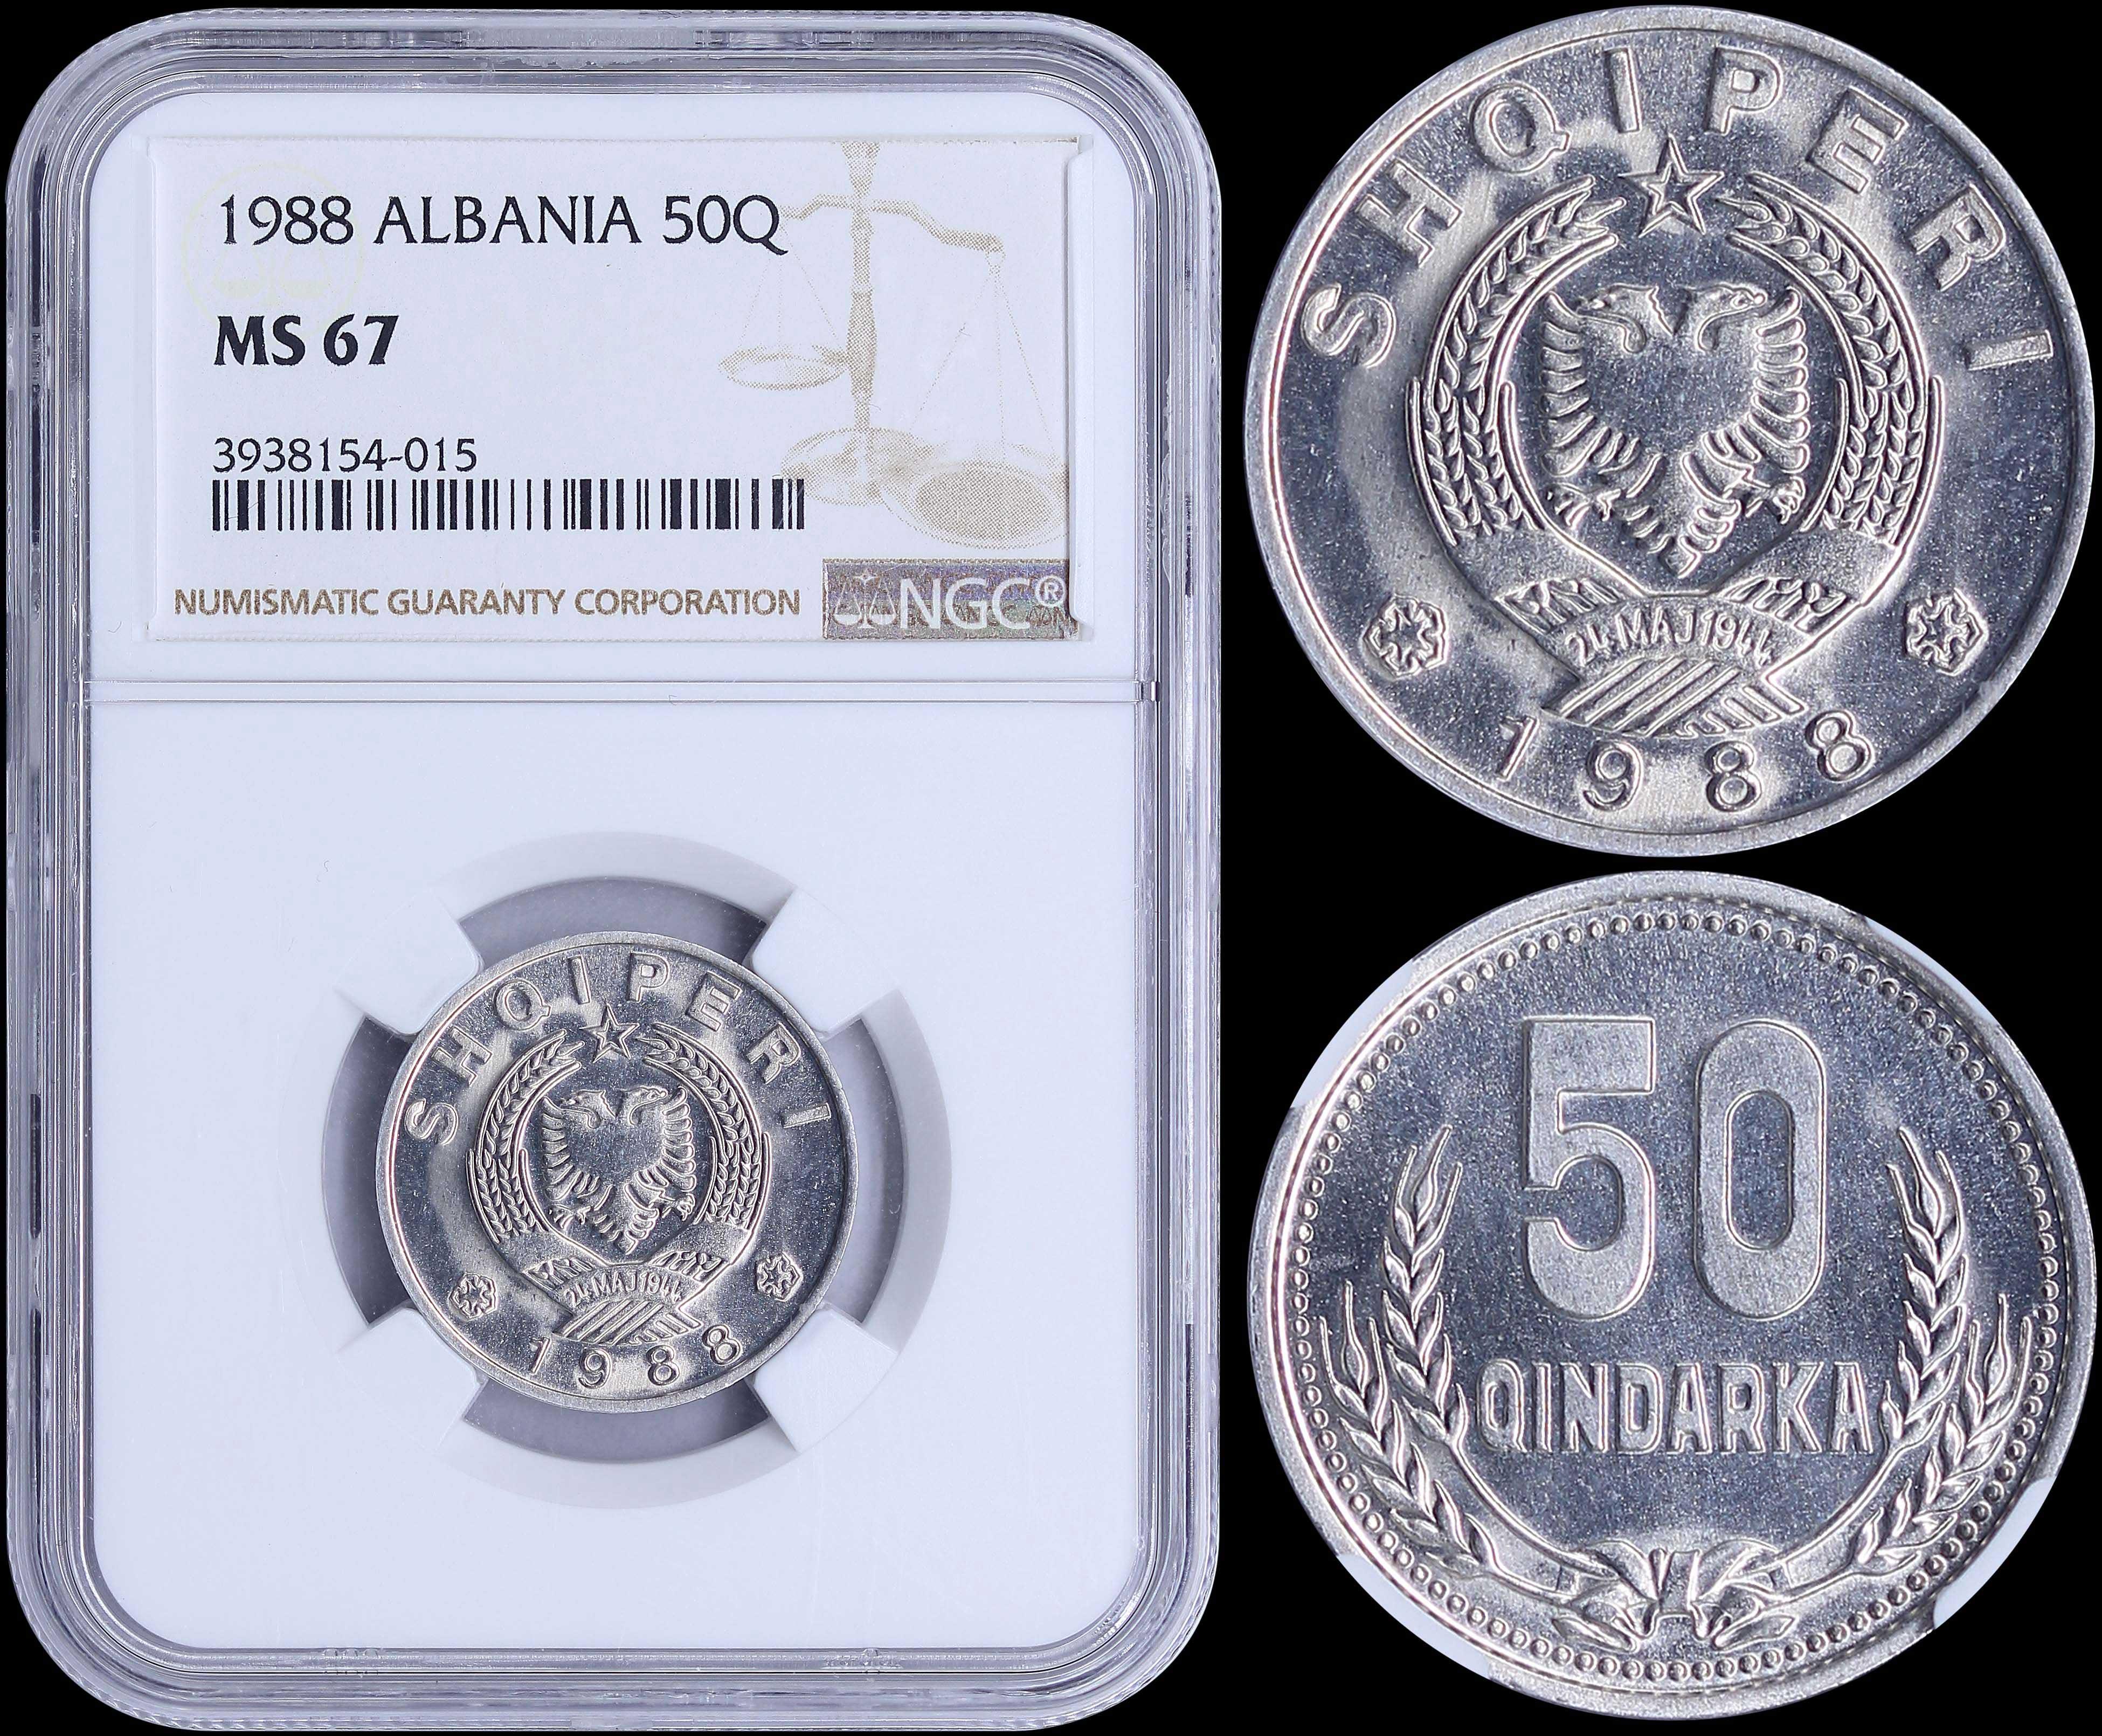 Lot 6777 - -  COINS & TOKENS COINS & TOKENS OF EUROPEAN COUNTRIES -  A. Karamitsos Postal & Live Internet Auction 984 (Part B)